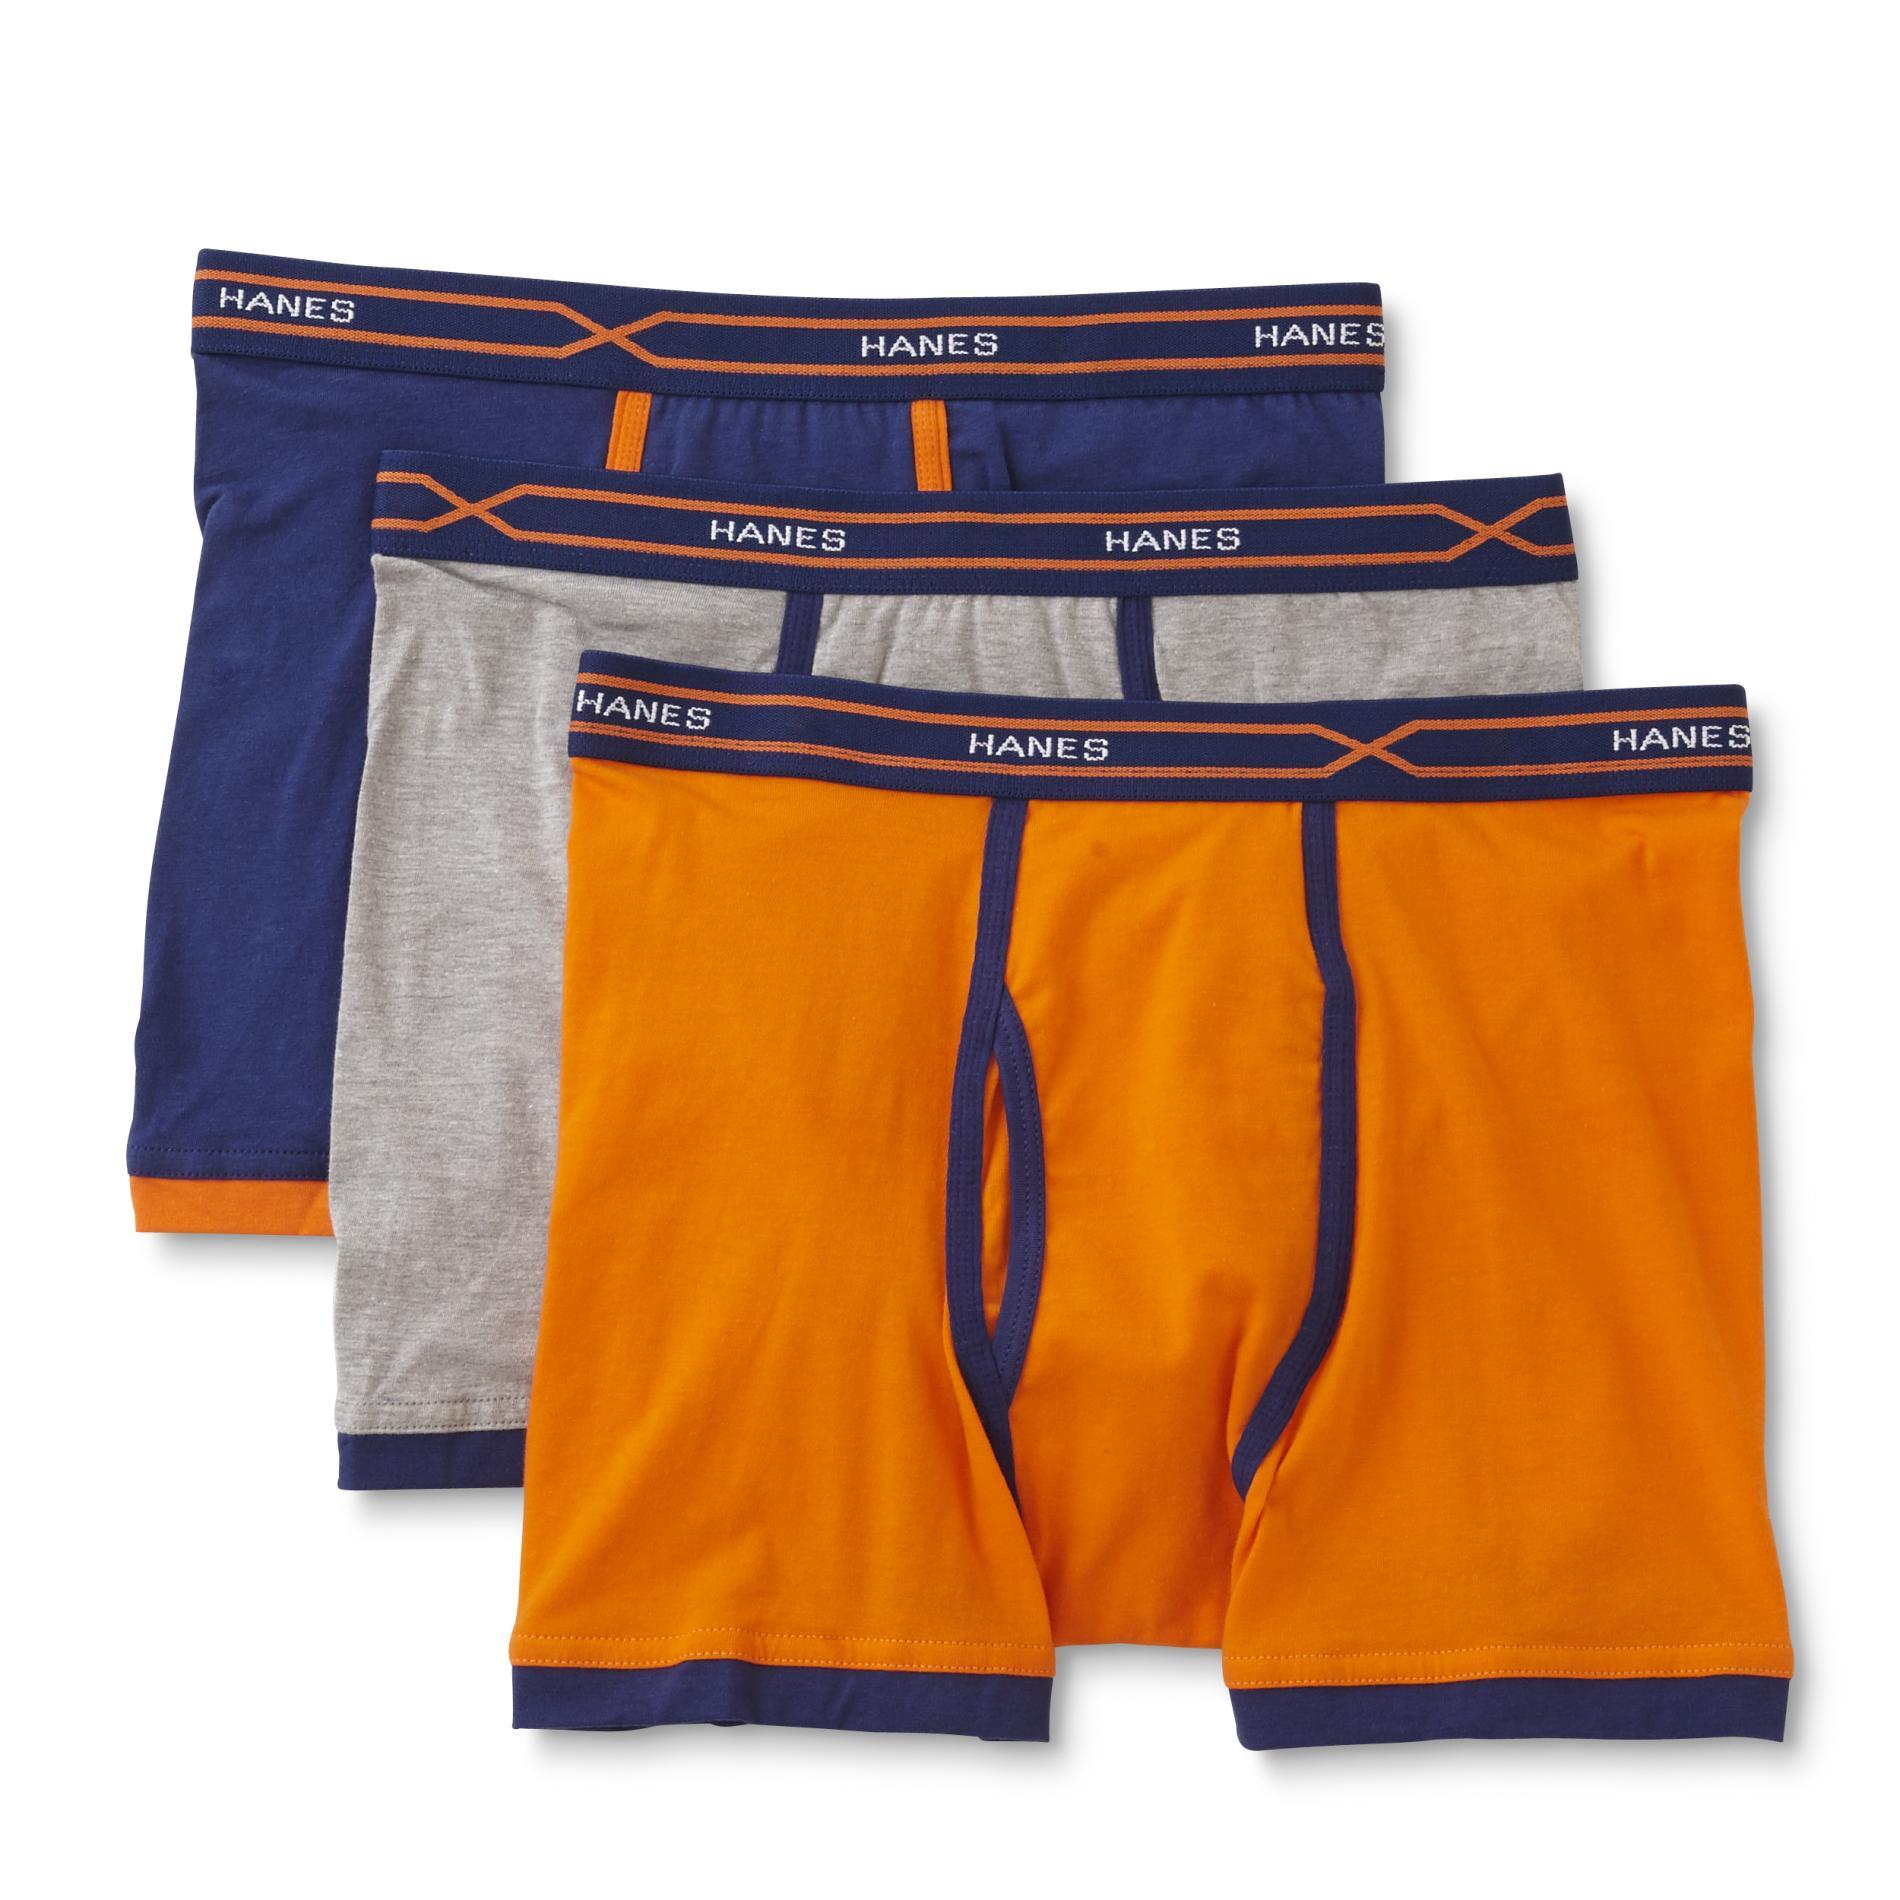 Hanes Men' 4-pairs X-temp Short Leg Boxer Briefs